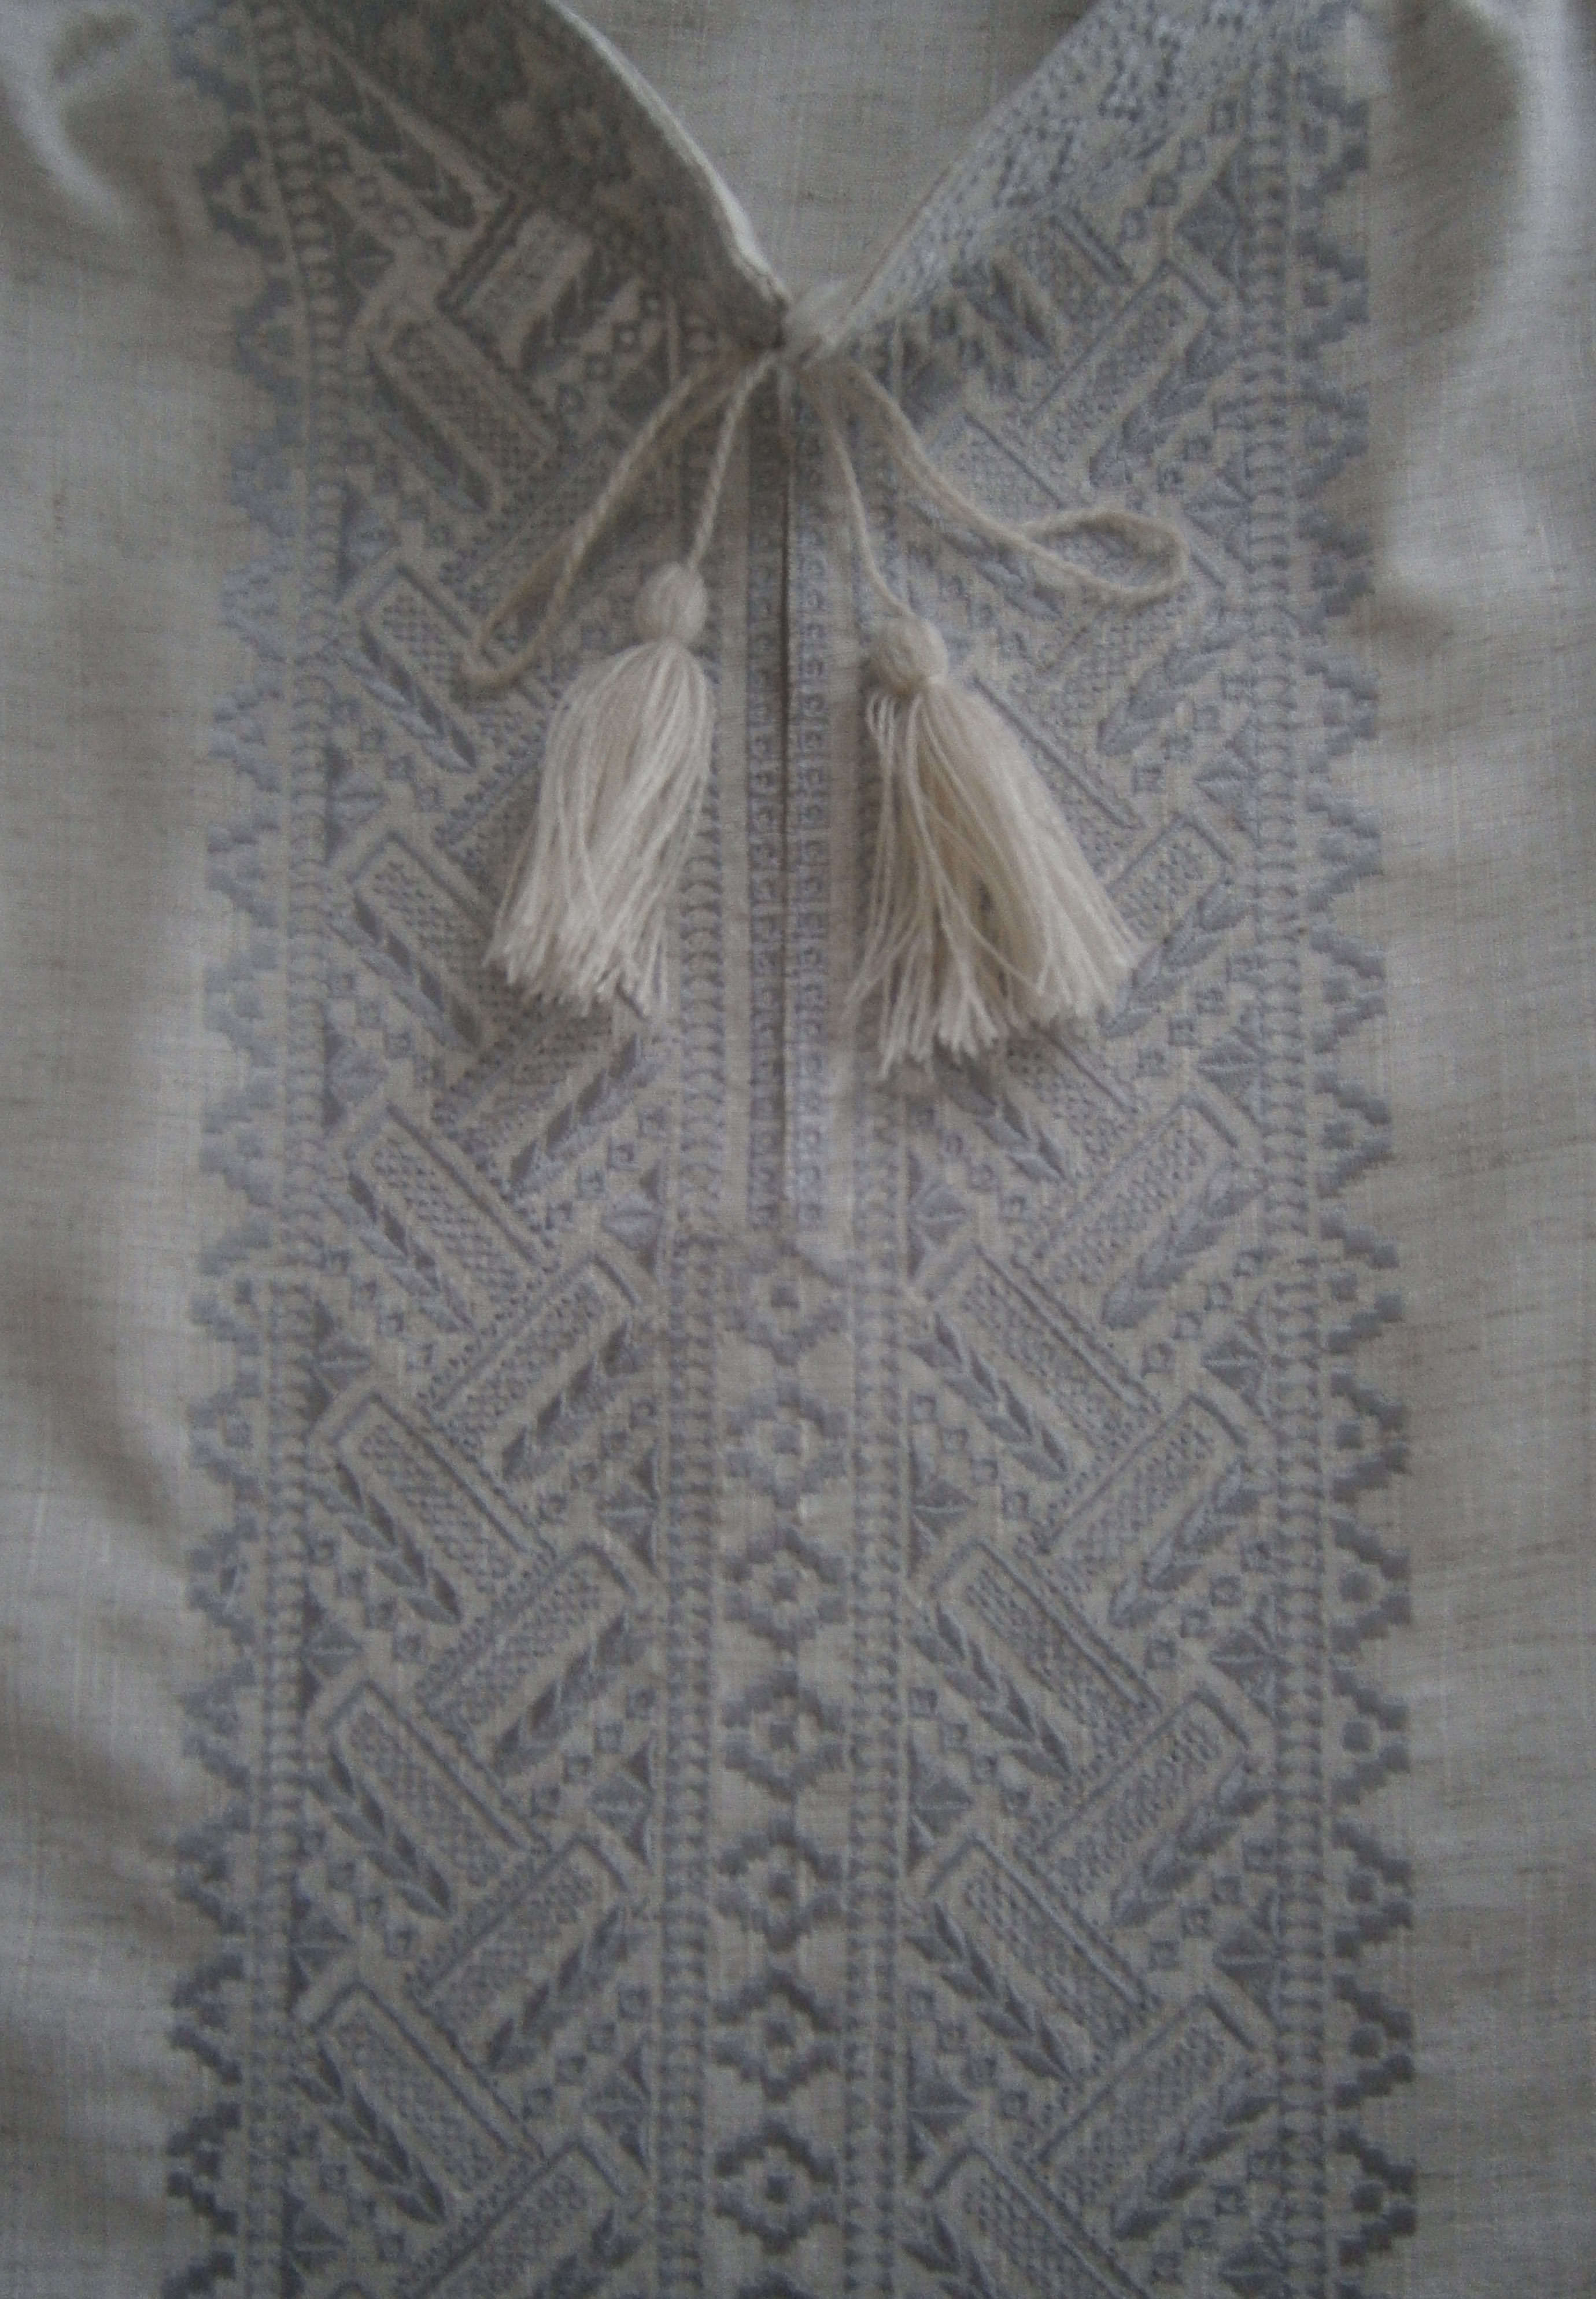 вишиванка чоловіча безпосередньо на льоні (Арт. 00327) 1103cb8e7e2e4